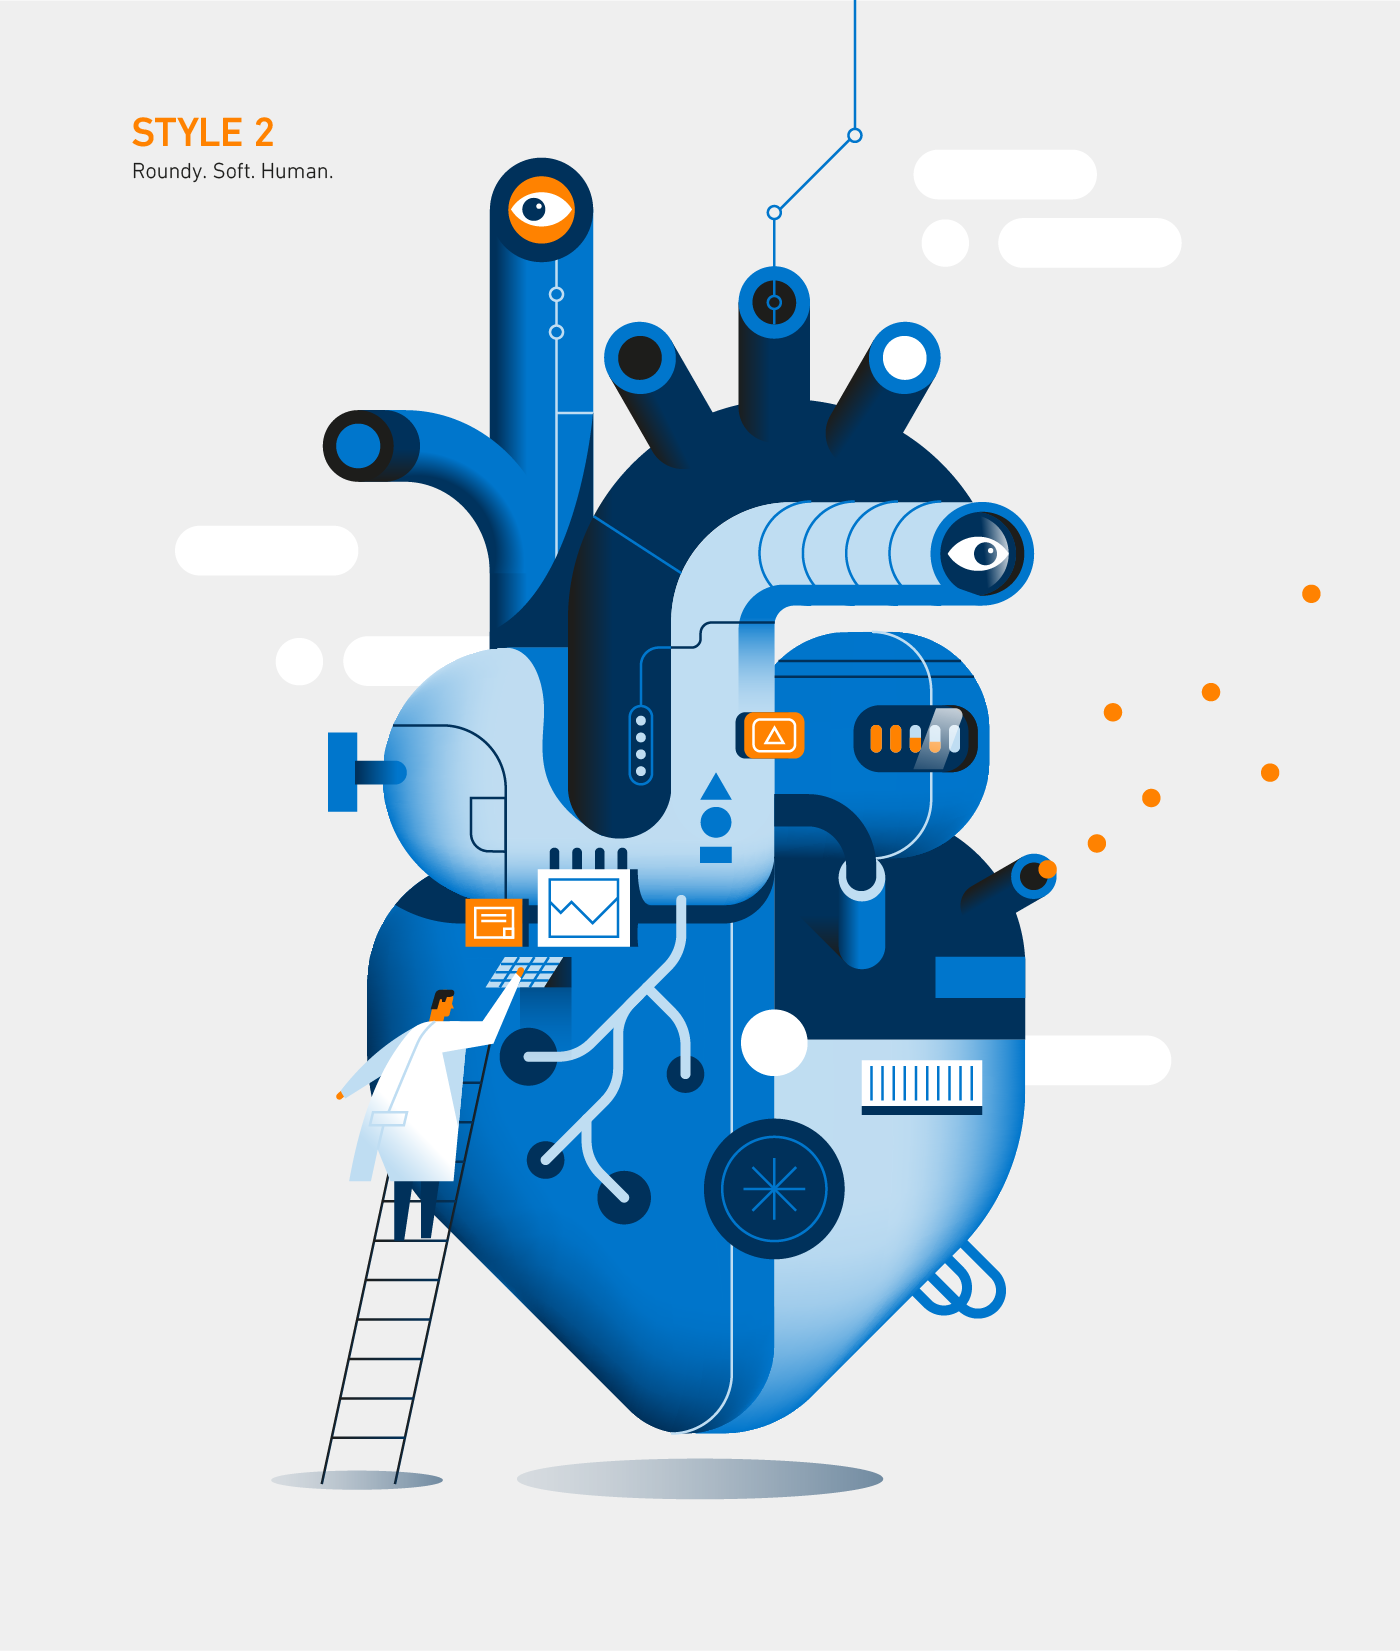 adobe illustrator Character design  Corporate Identity Digital Art  digital illustration ILLUSTRATION  vector vector art